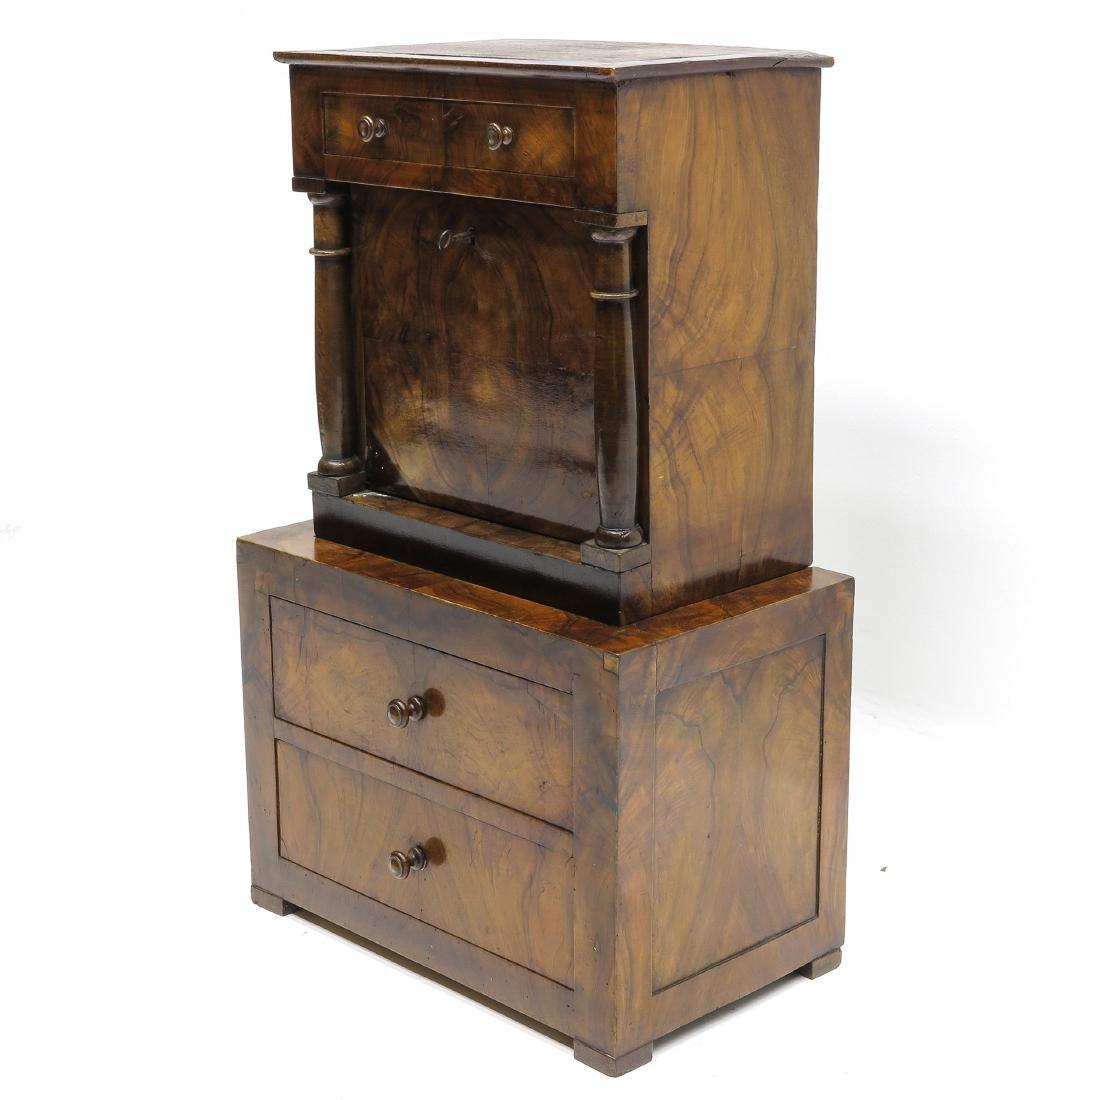 A 19th Century Miniature Walnut Cabinet - 4